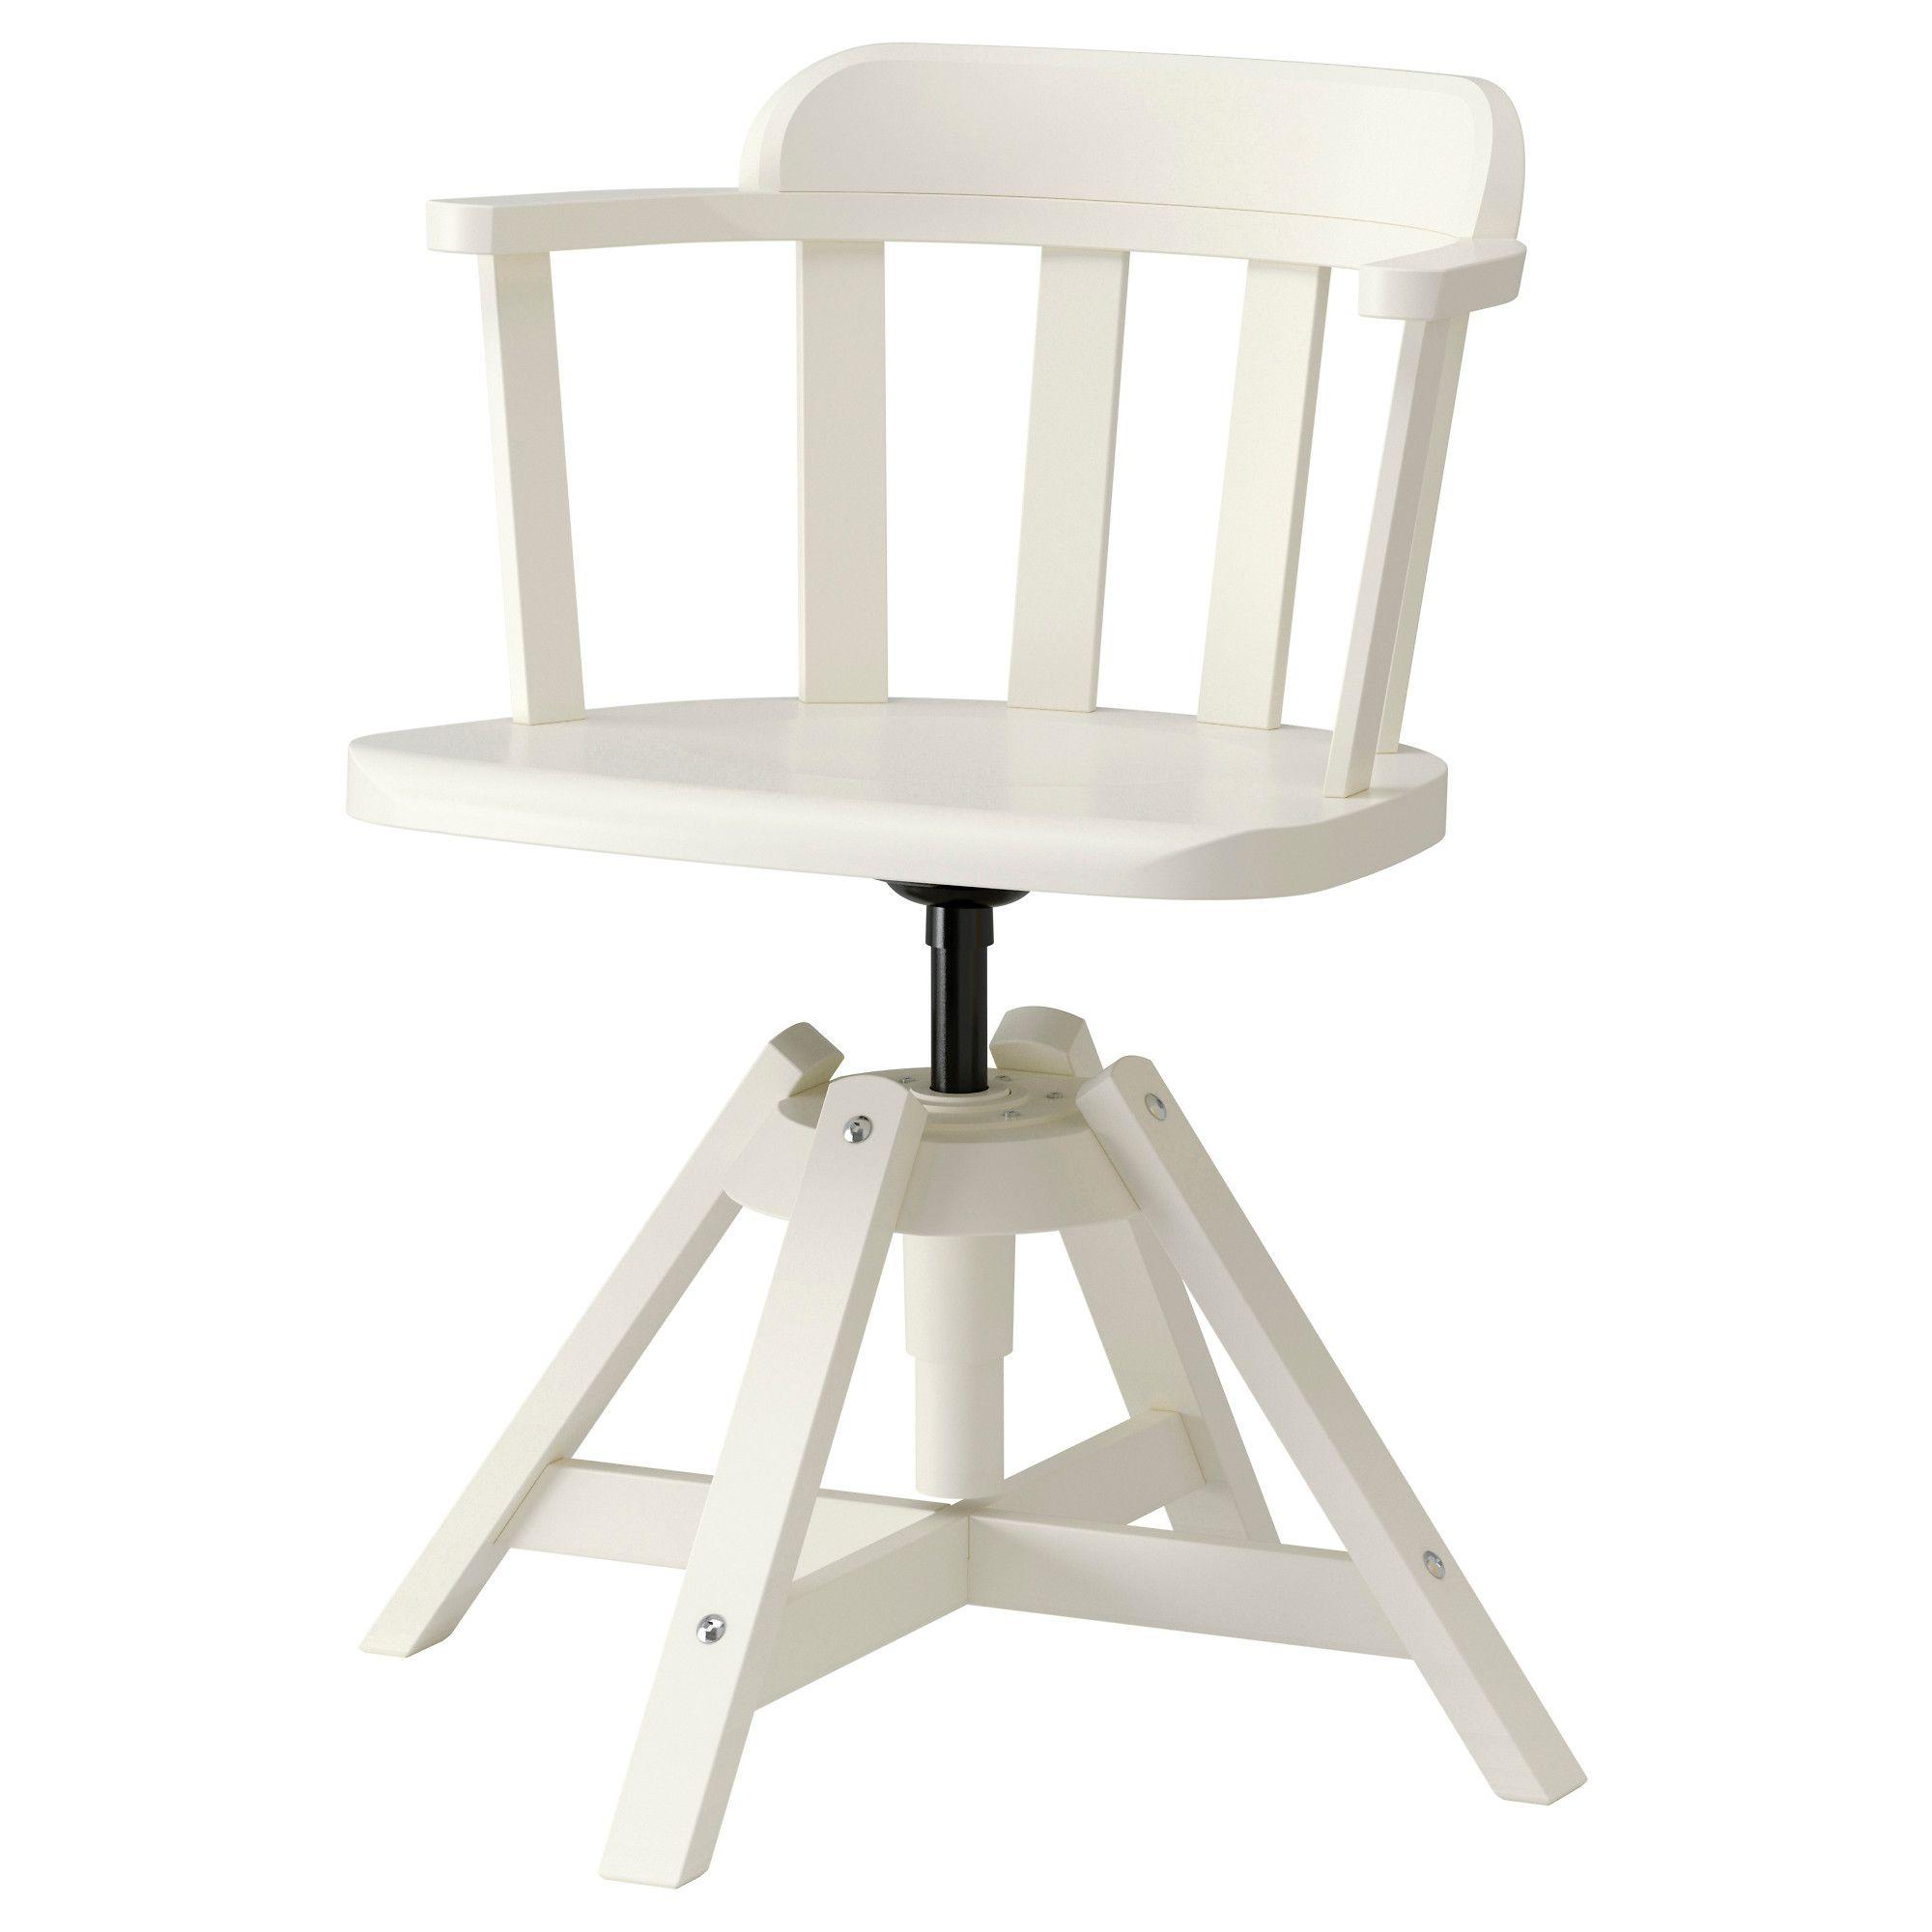 Ikea Us Furniture And Home Furnishings Chair Ikea Swivel Chair